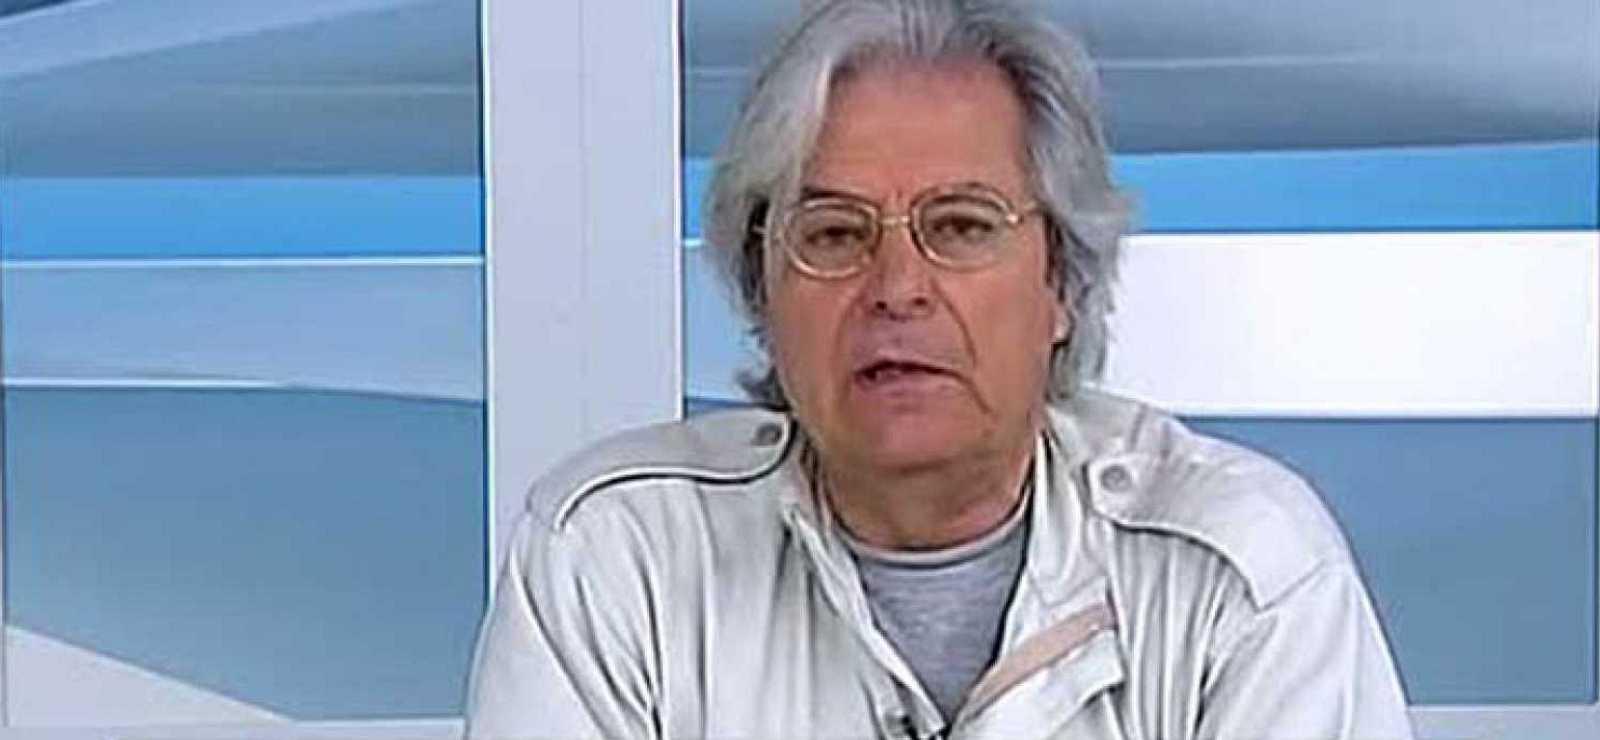 Crónicas de un nómada - Javier Nart - 16/02/21 - Escuchar ahora